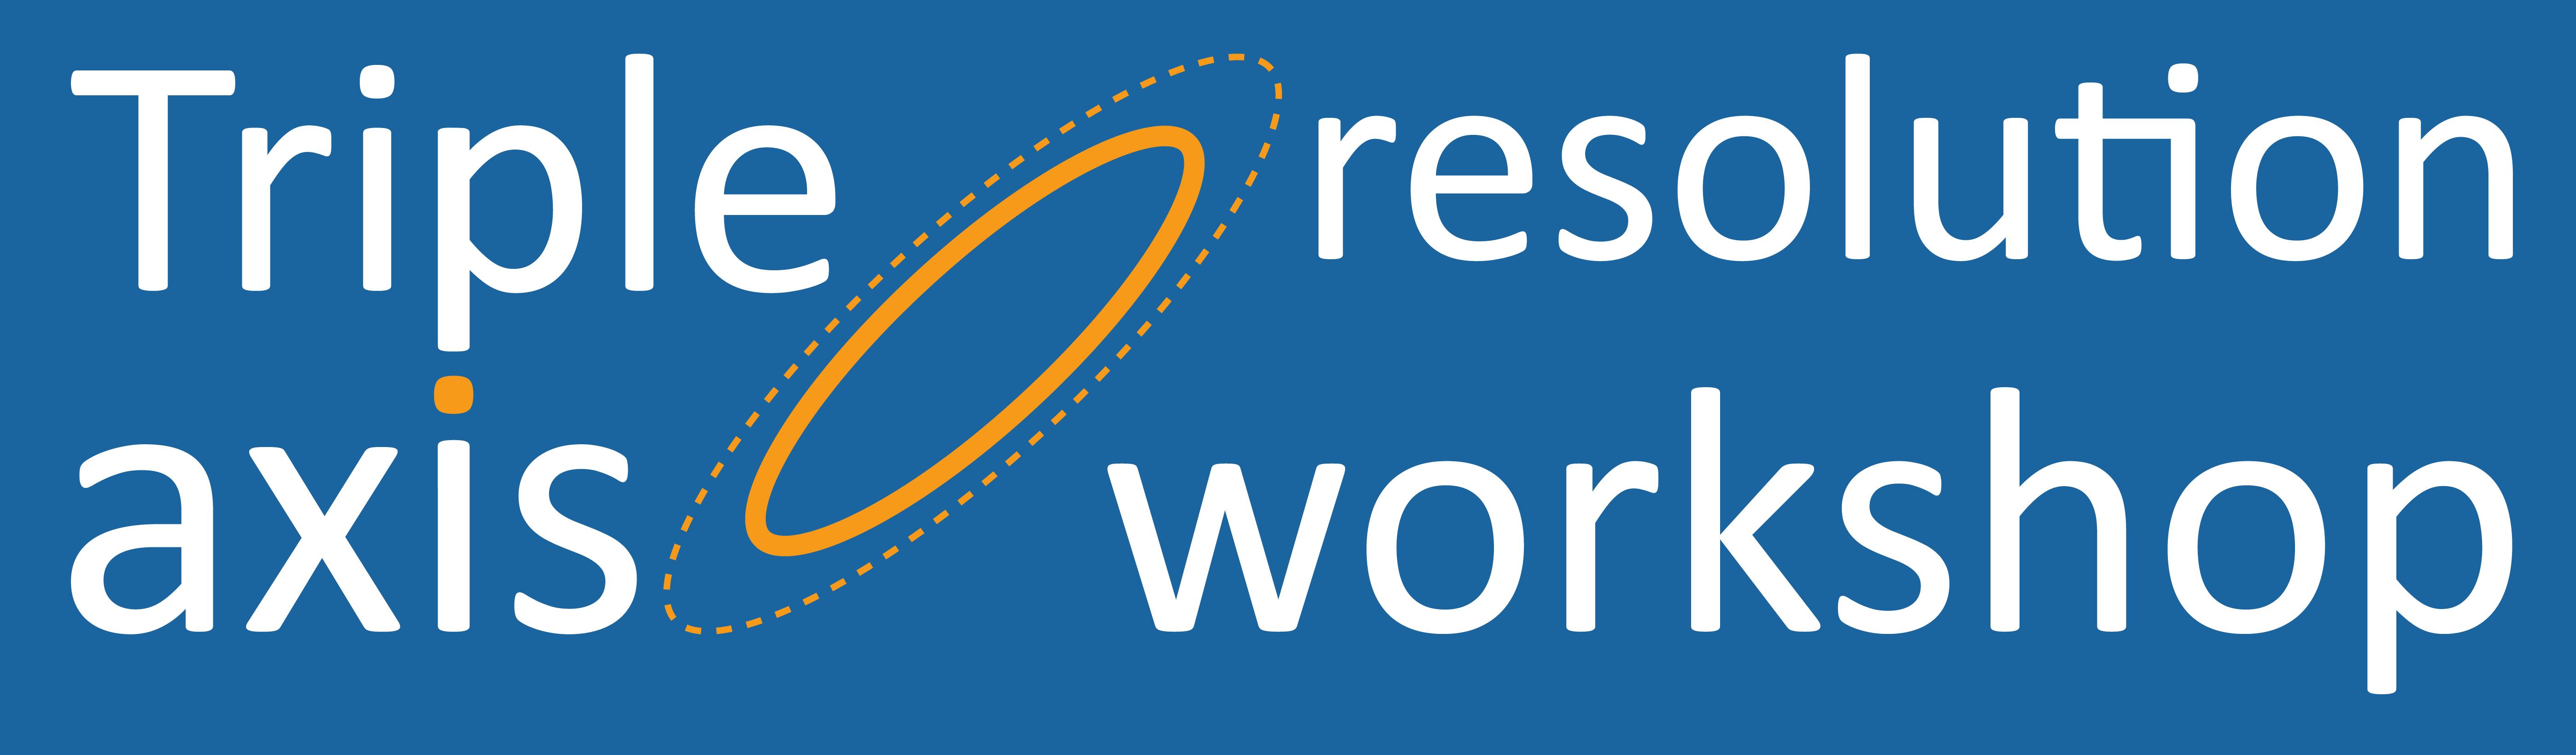 Quantum phenomena group: Triple axis resolution workshop